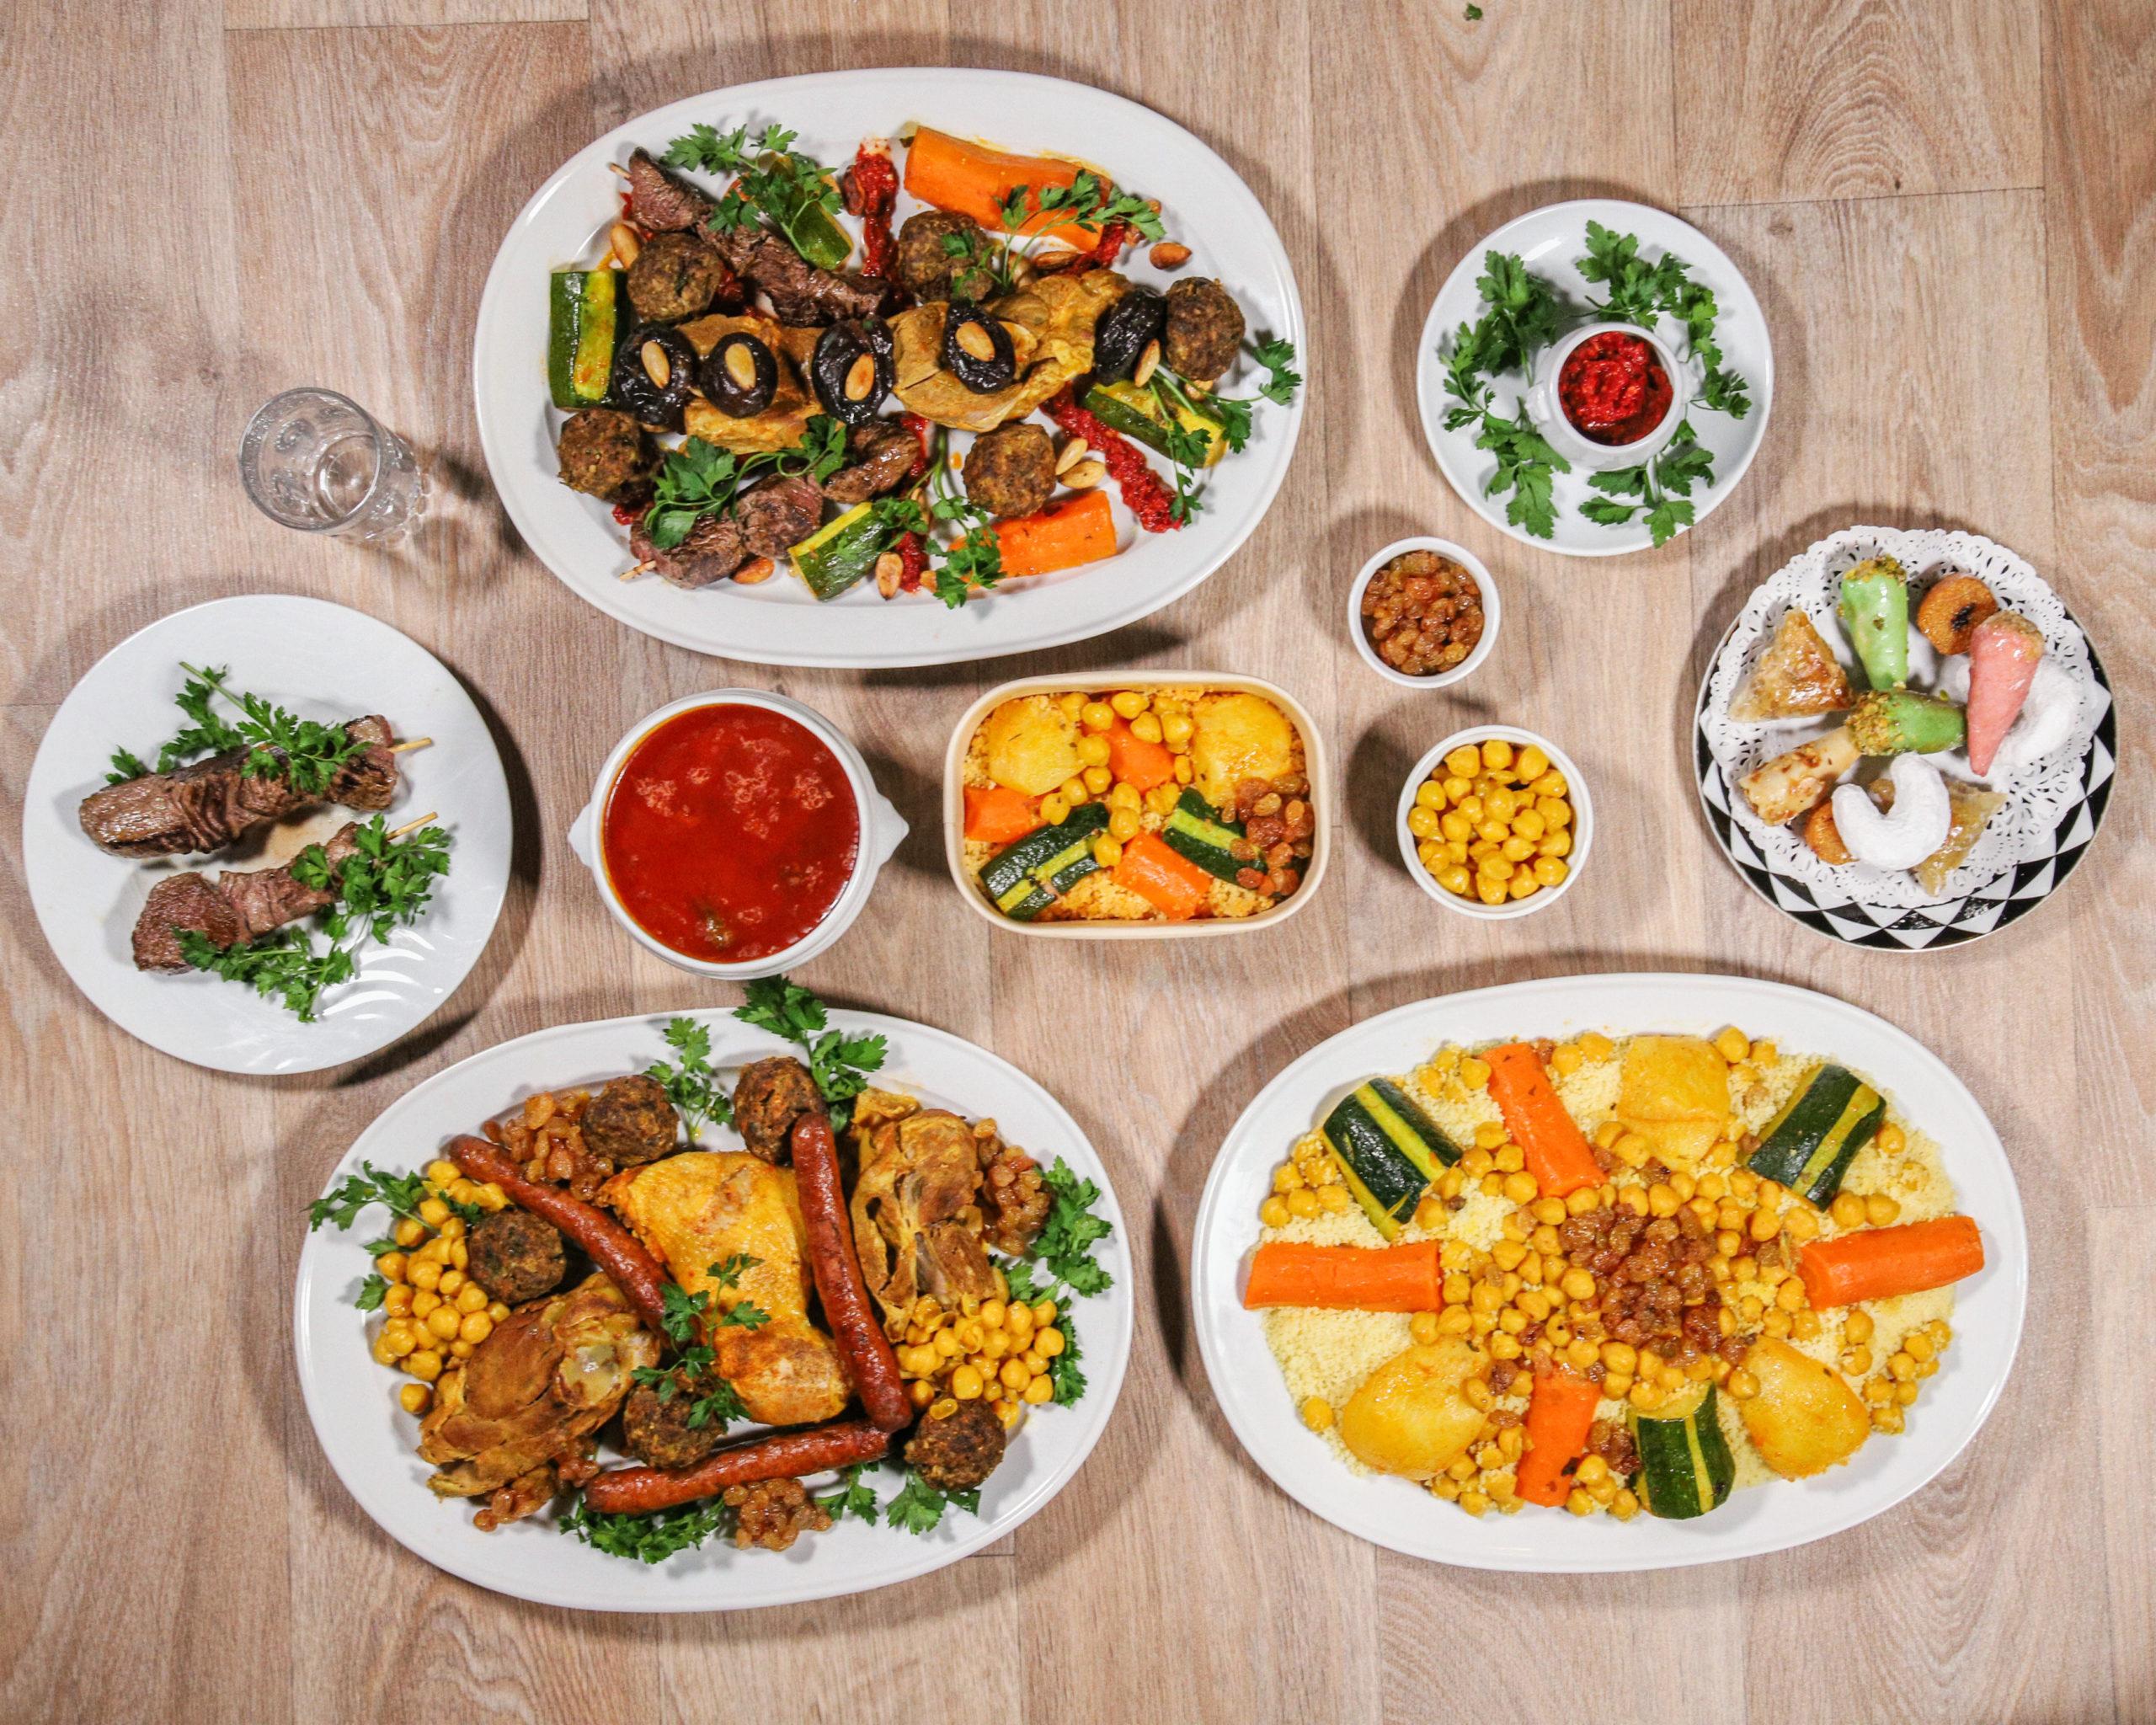 photoshoot_for_restaurant_largan__la_madeleine_composition_hero_2